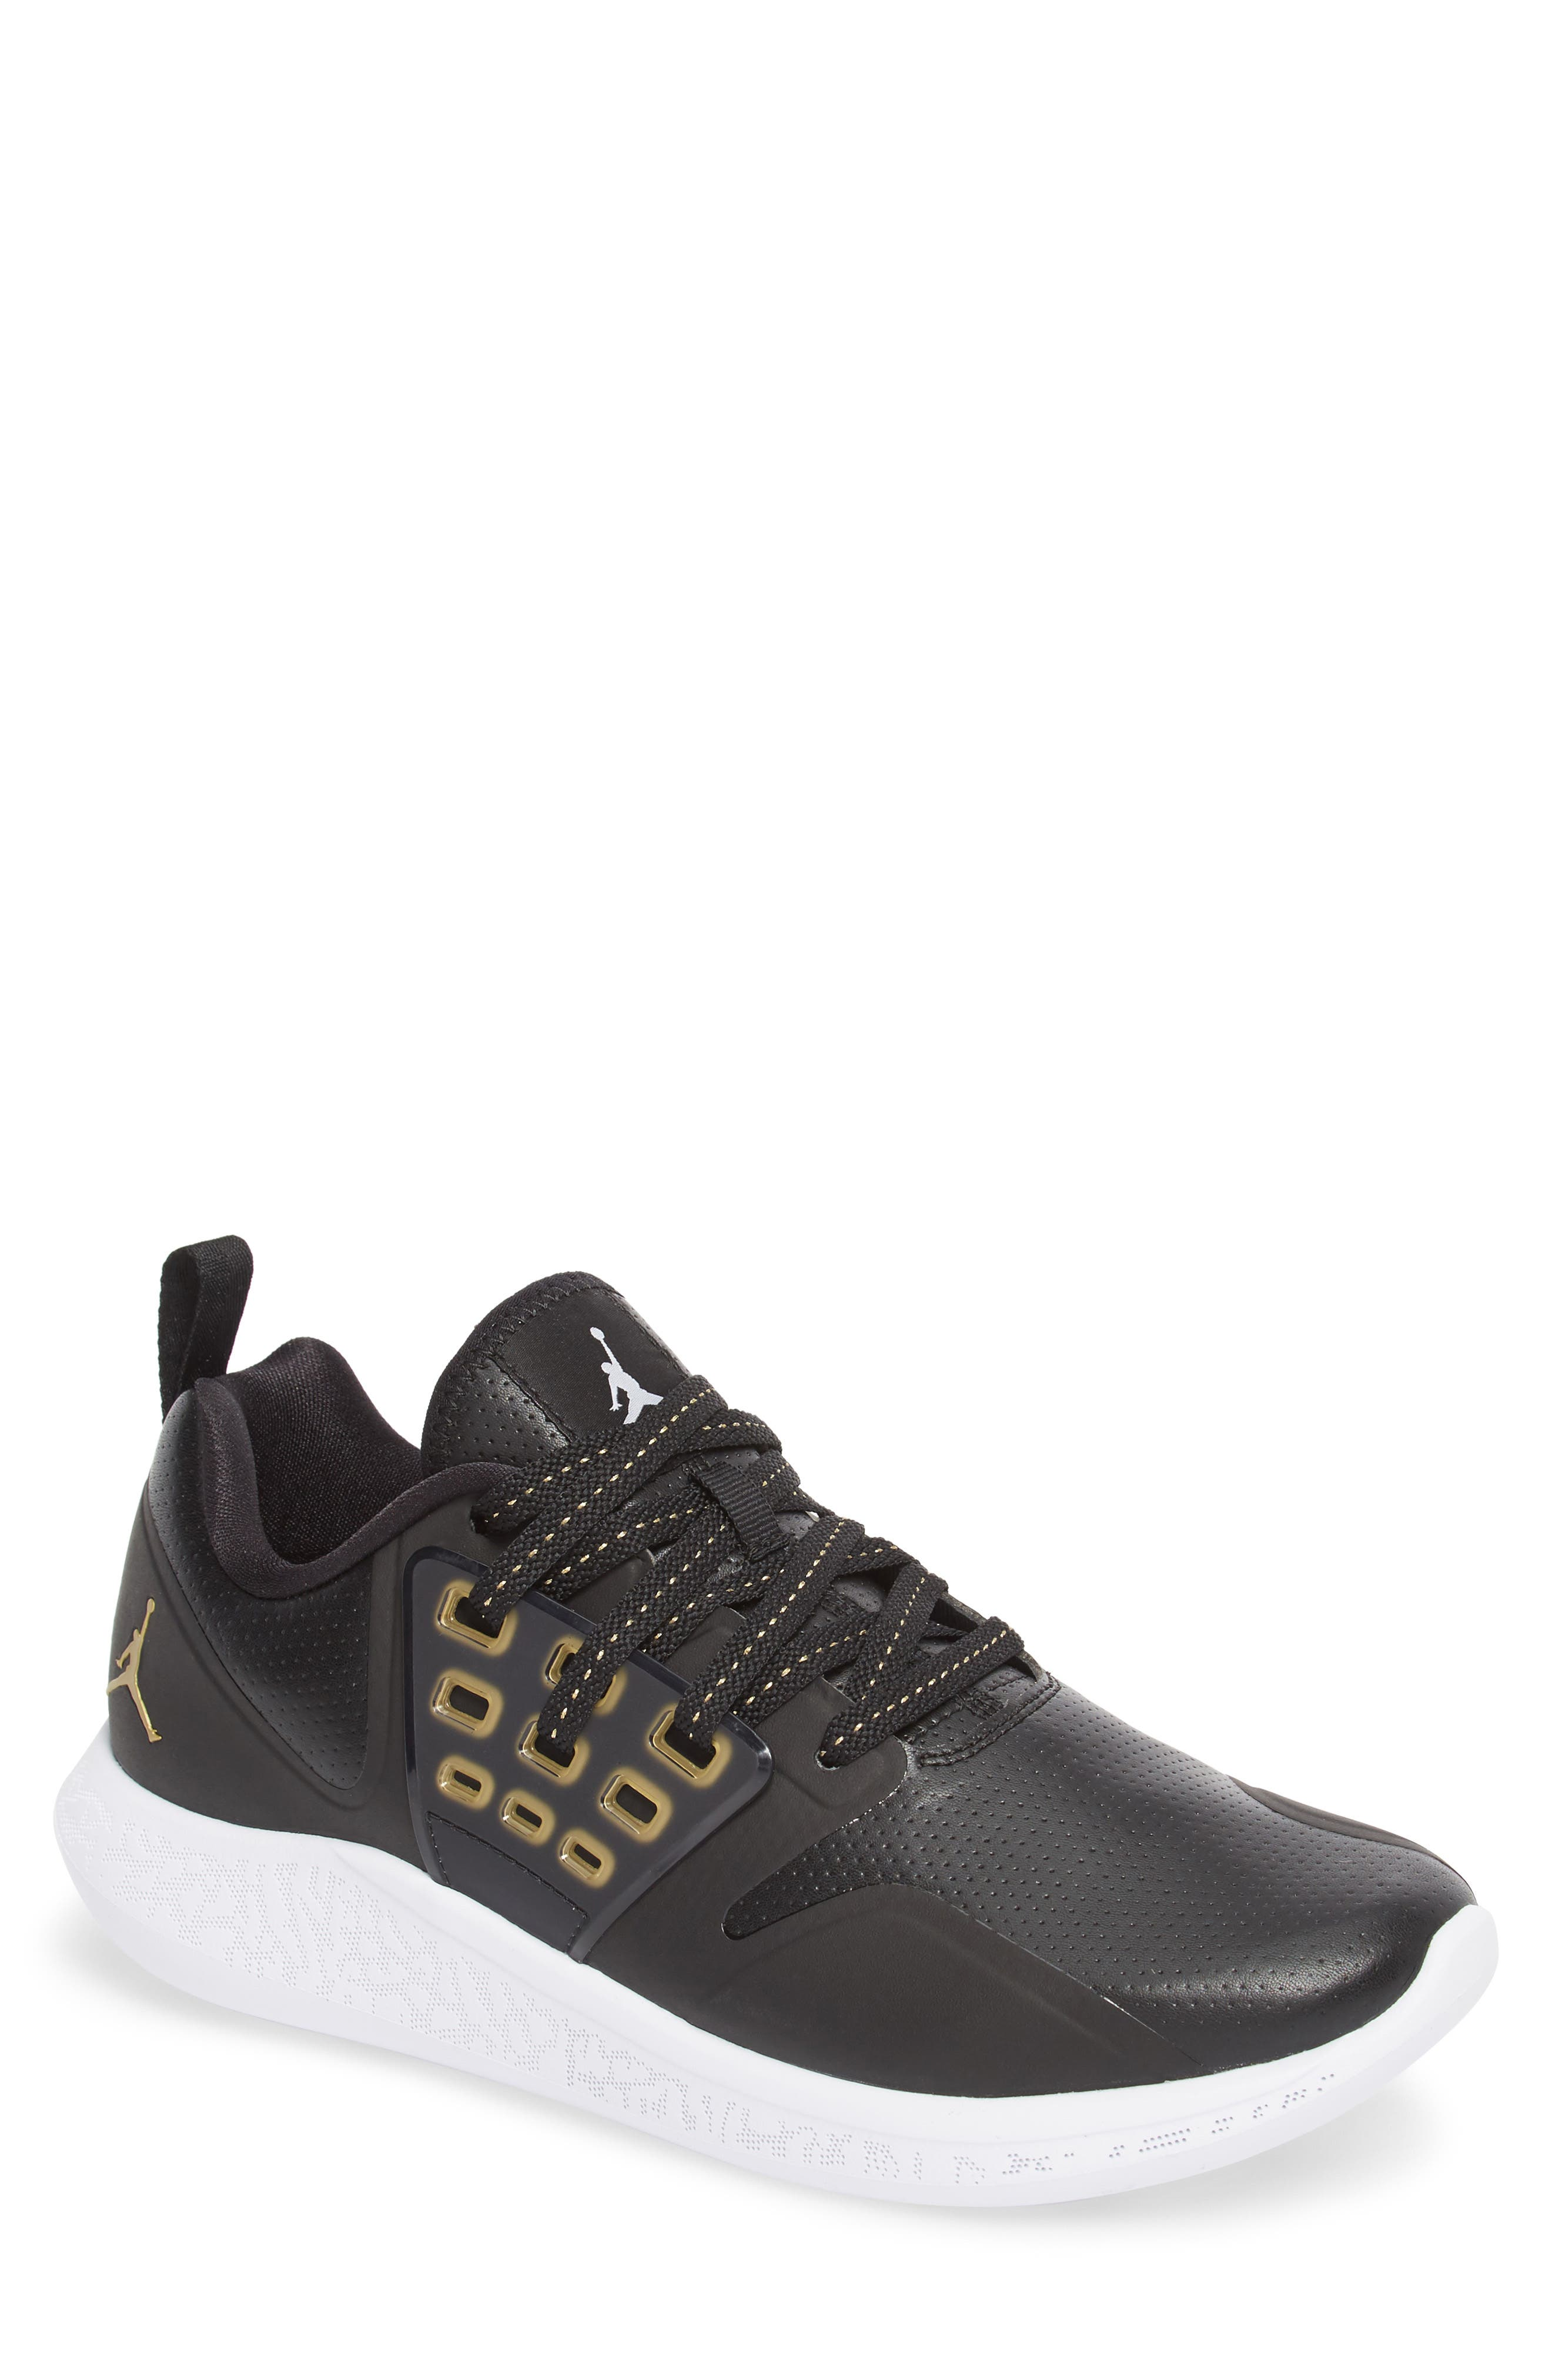 Jordan Grind Running Shoe,                             Main thumbnail 1, color,                             001